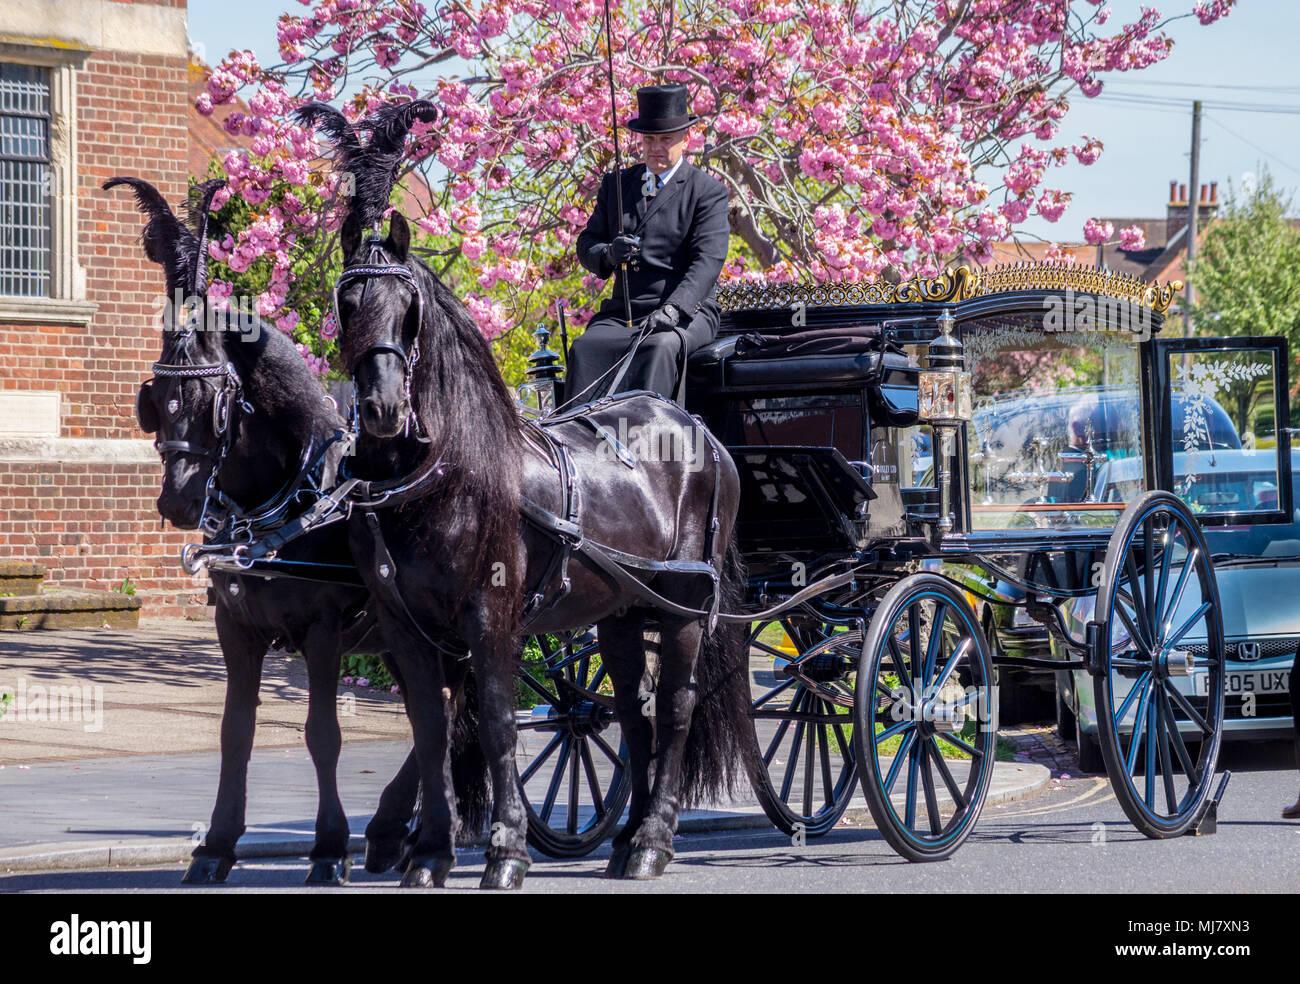 a-horse-drawn-hearse-outside-frinton-free-church-by-william-hayne-1911-1935-italianate-style-connaught-avenue-frinton-on-sea-essex-england-MJ7XN3.jpg